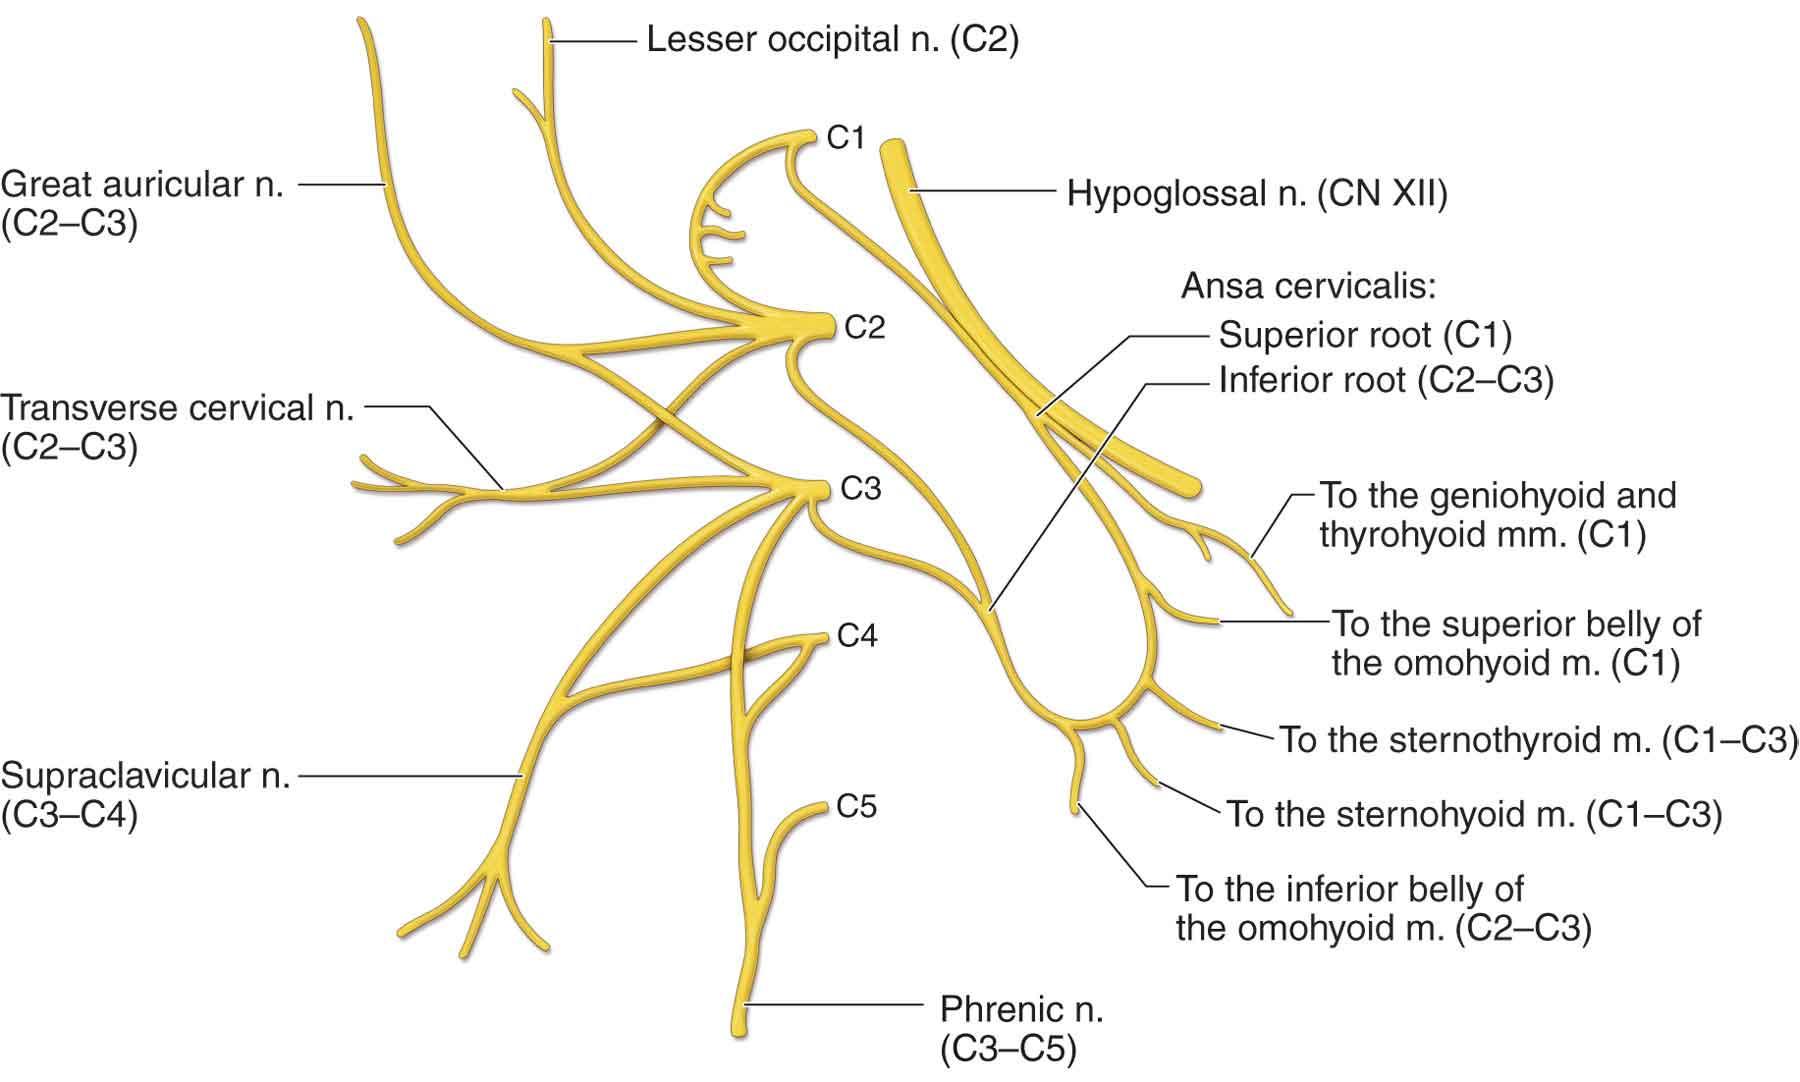 cat neck muscles diagram nissan frontier wiring 2000 of nerves in back spleen